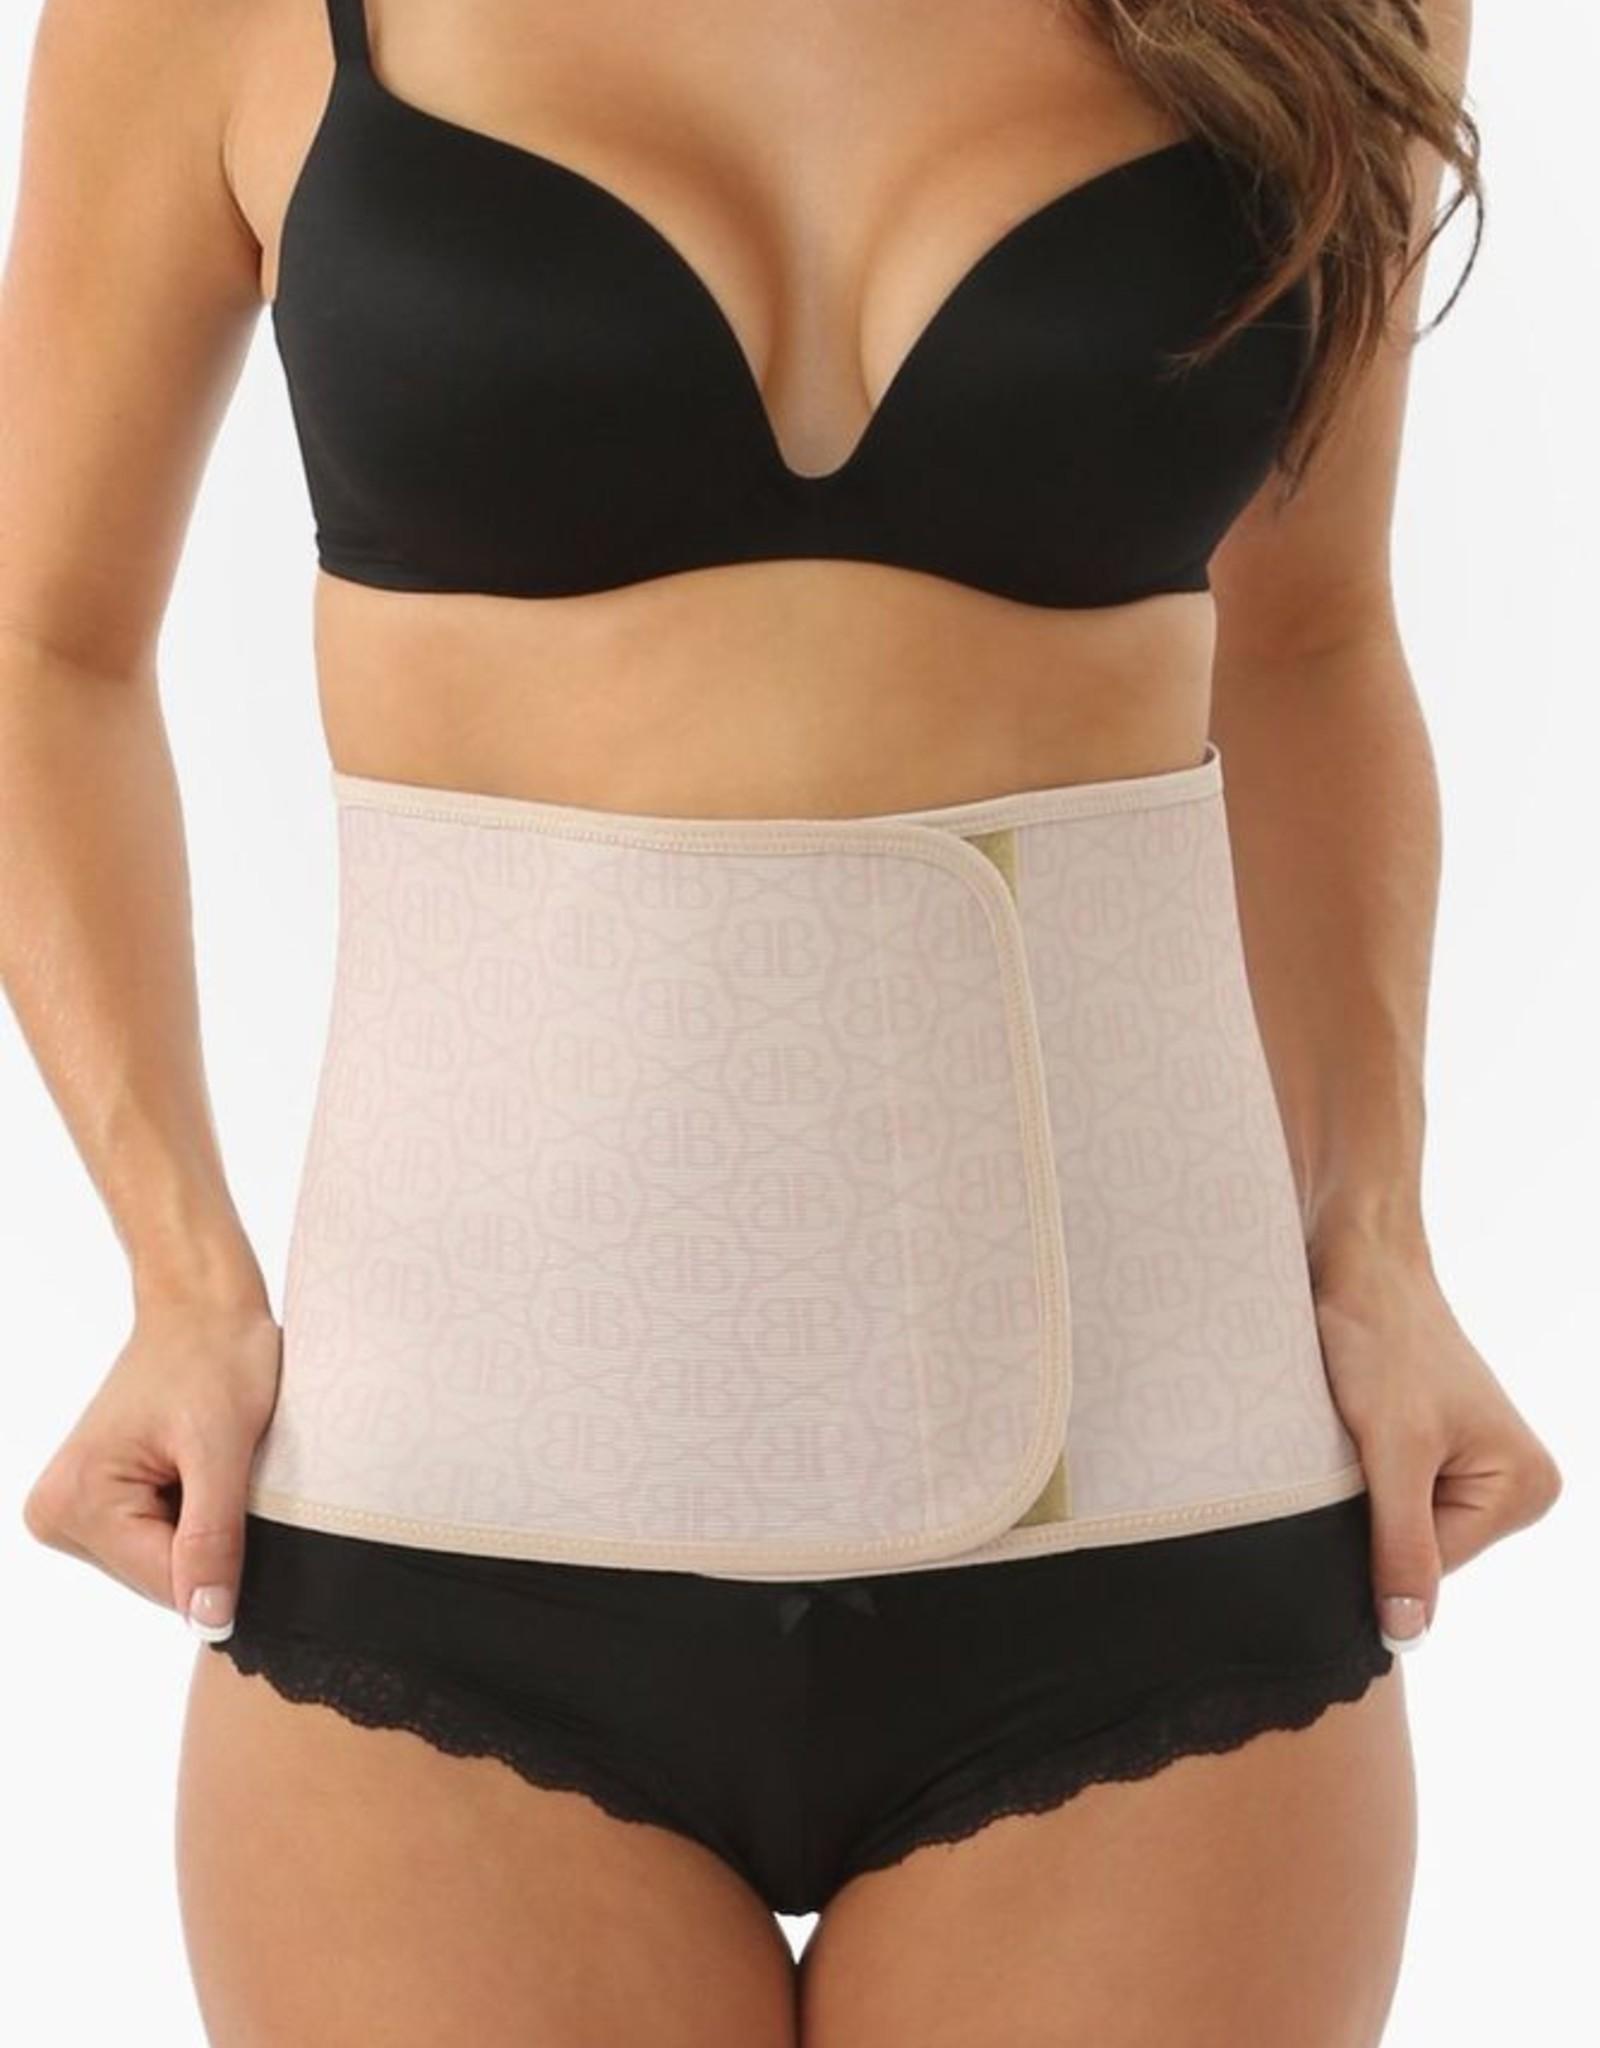 Belly Bandit Original Belly Wrap